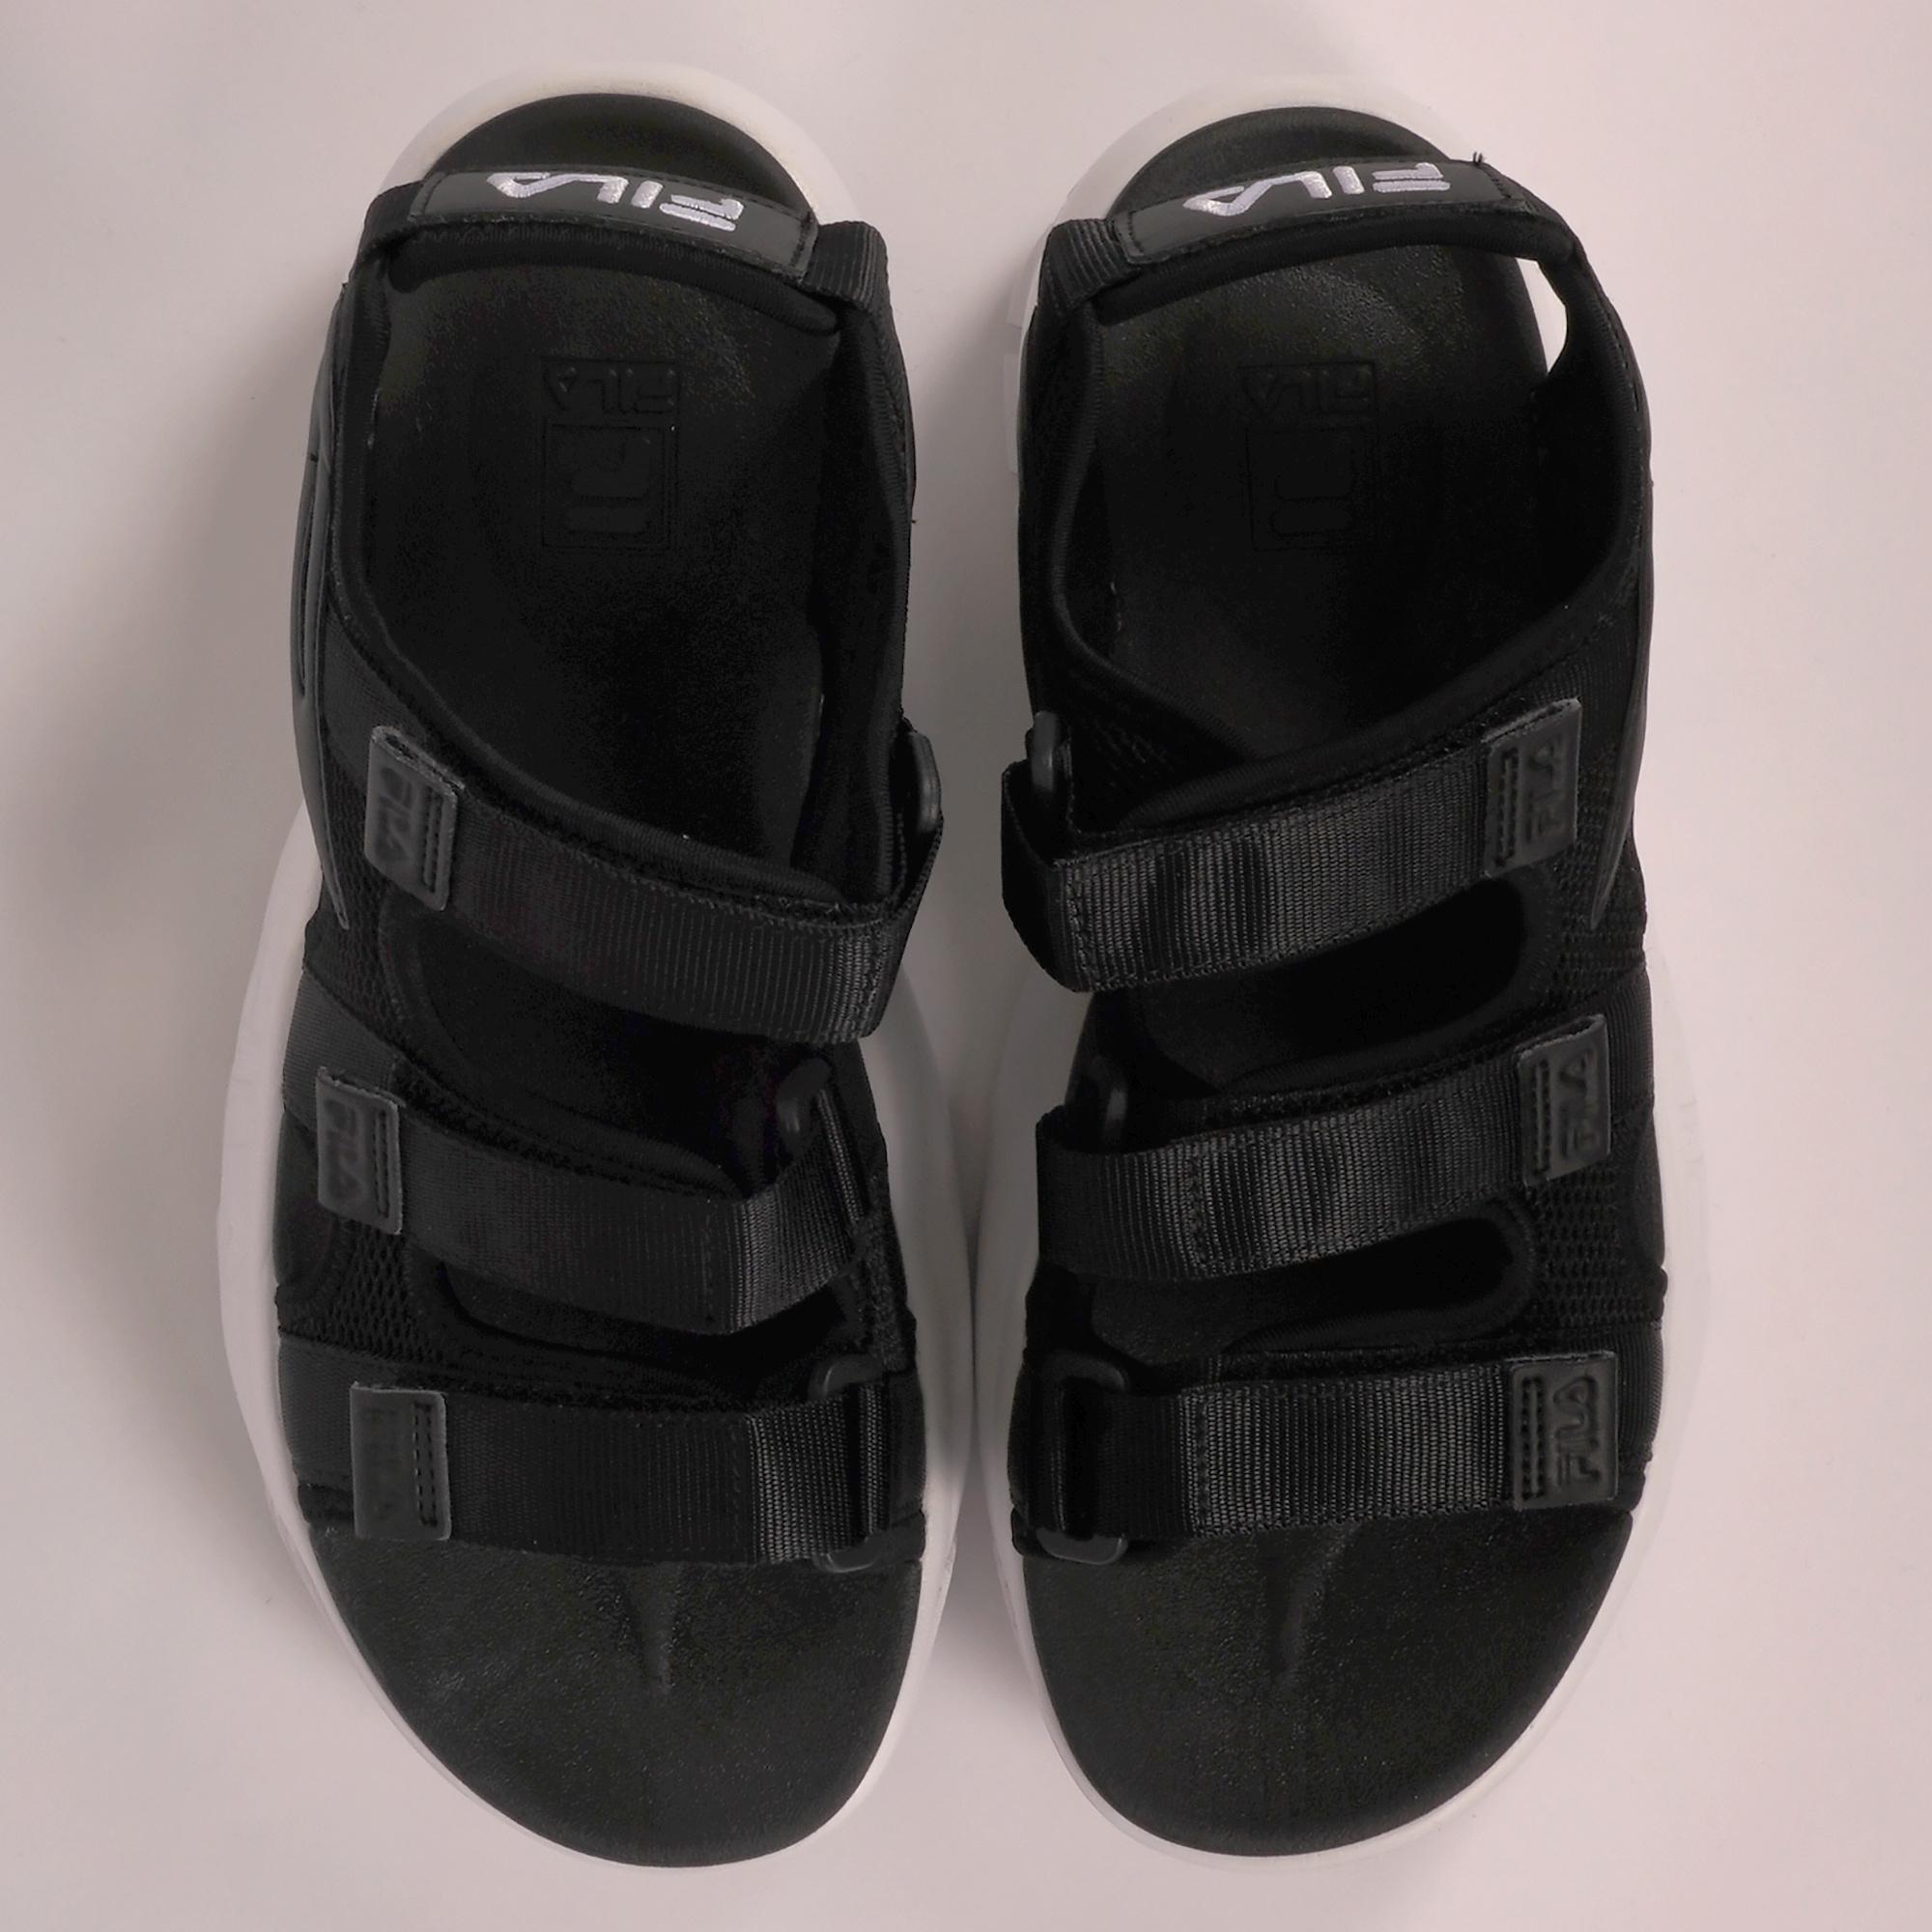 fila disruptor sandals all black